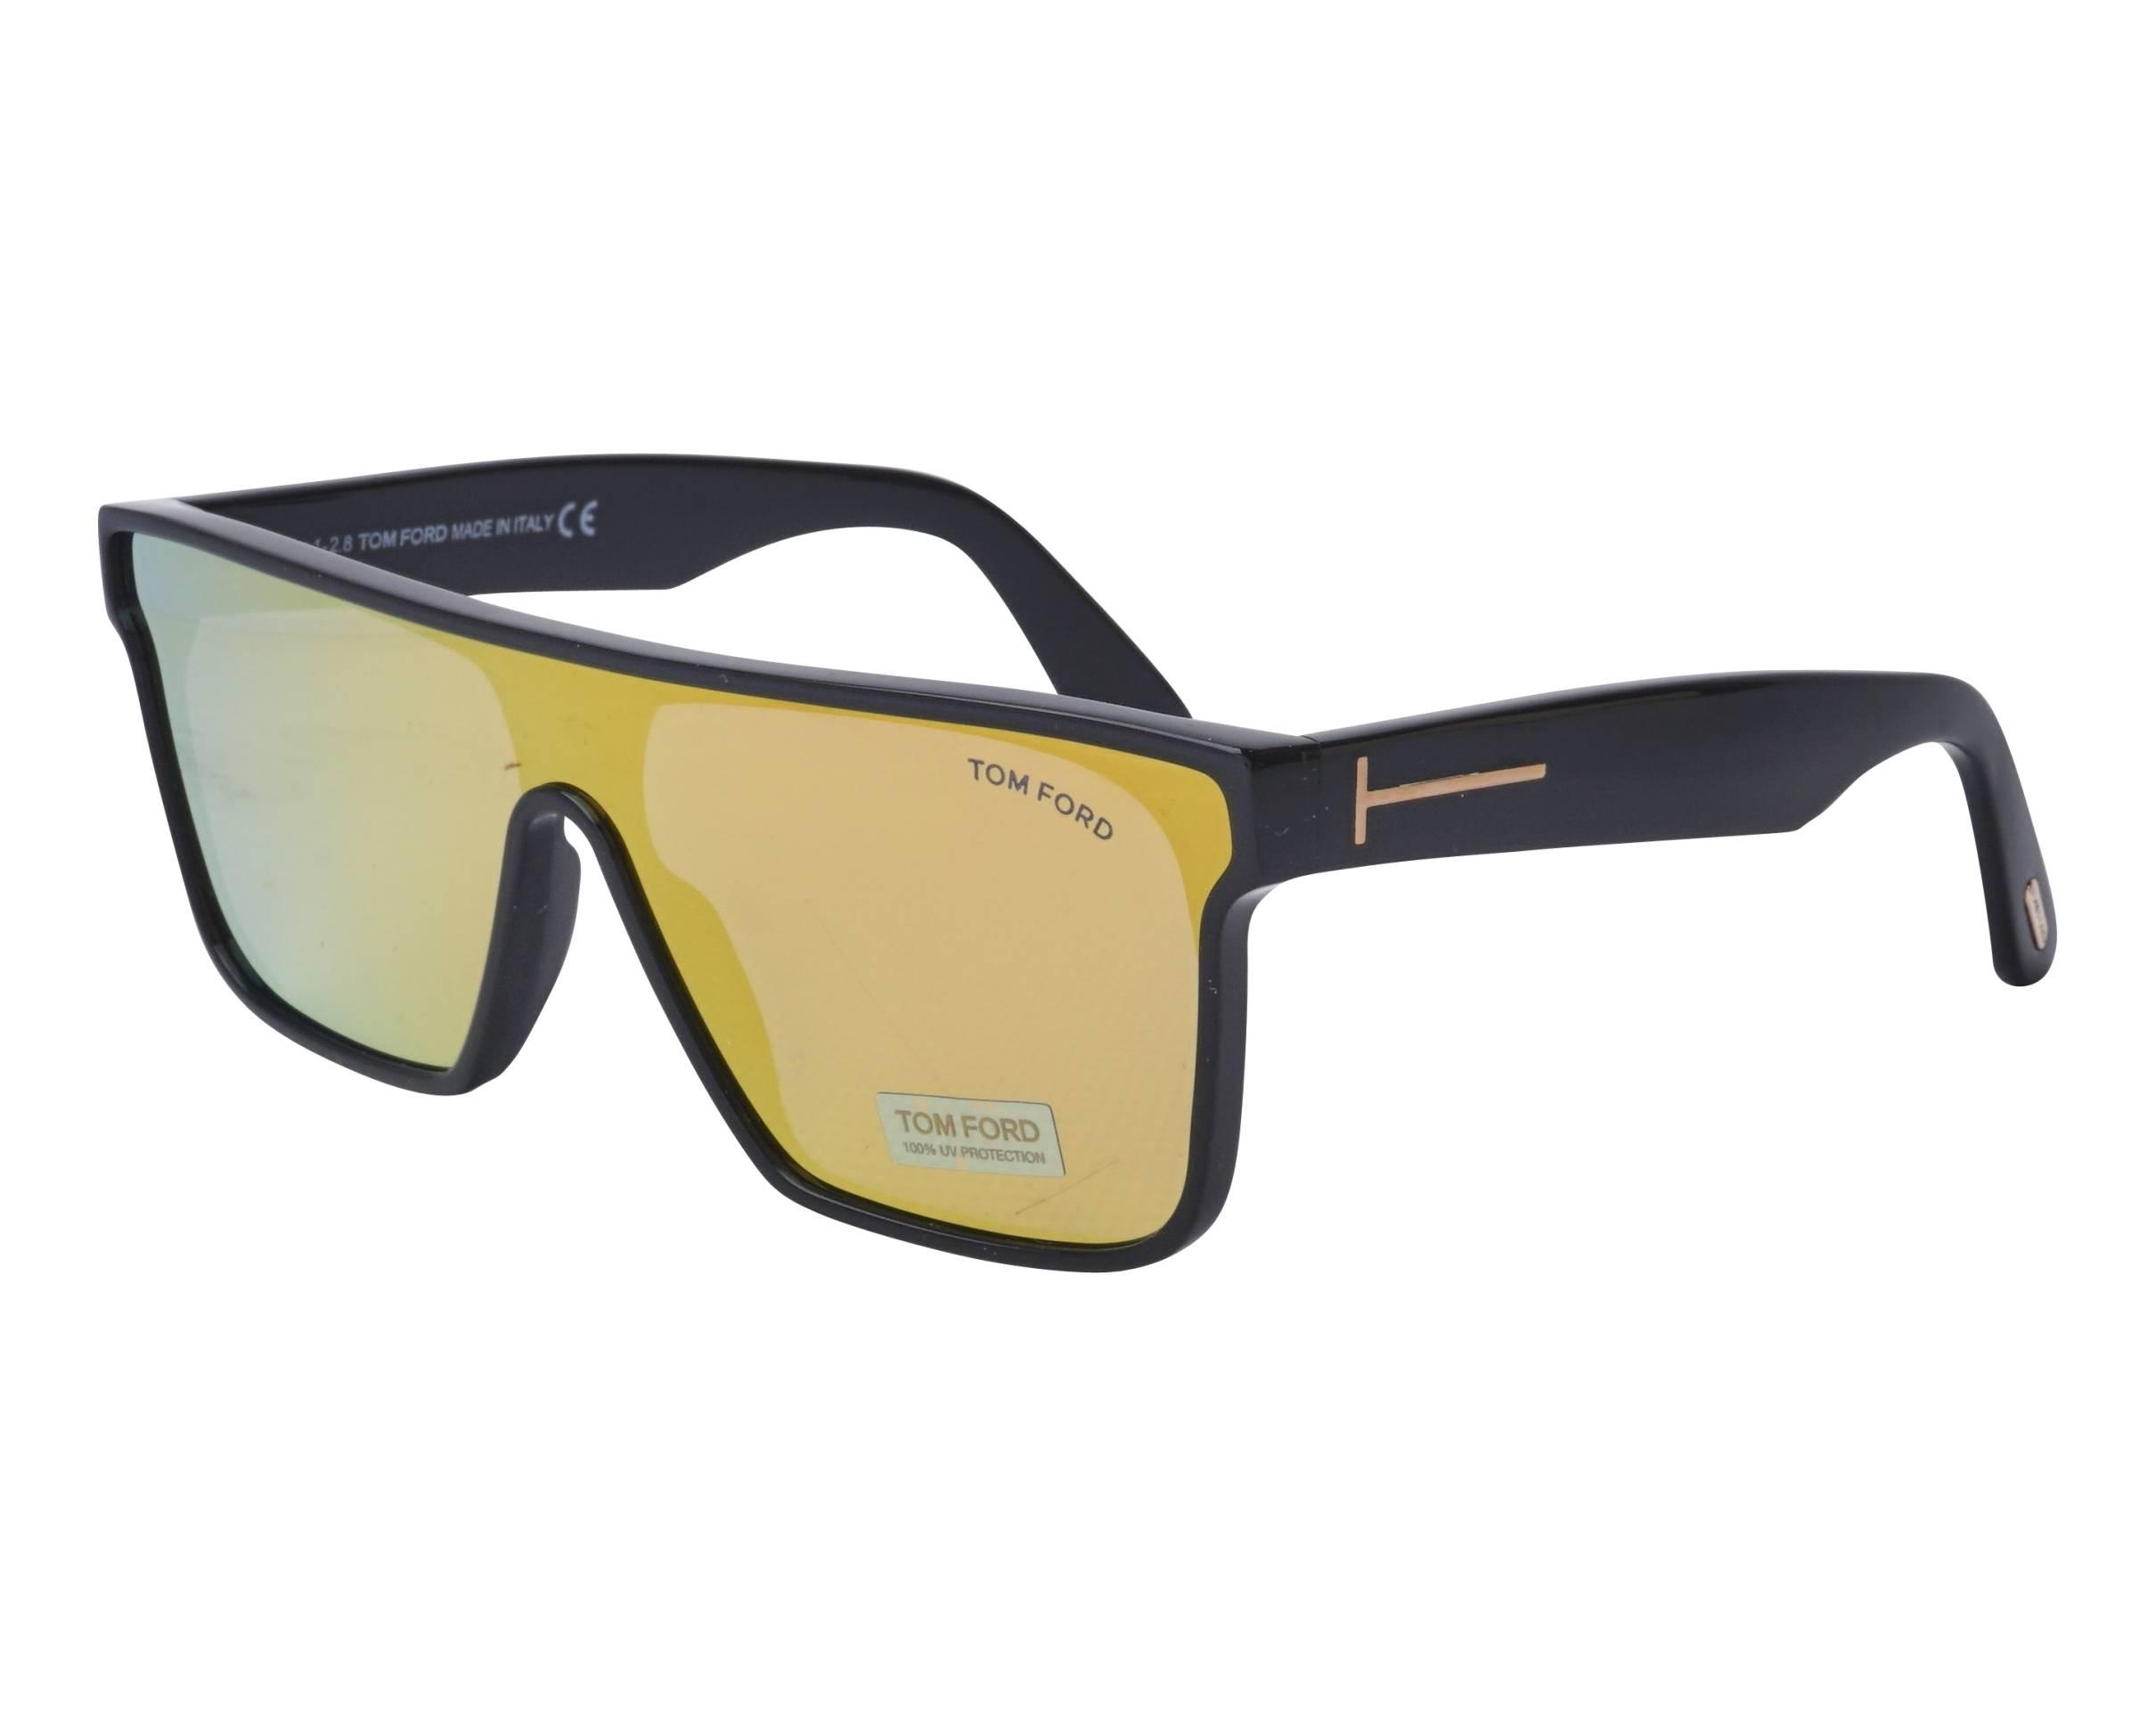 Sunglasses Tom Ford Whyat Tf 709 01g